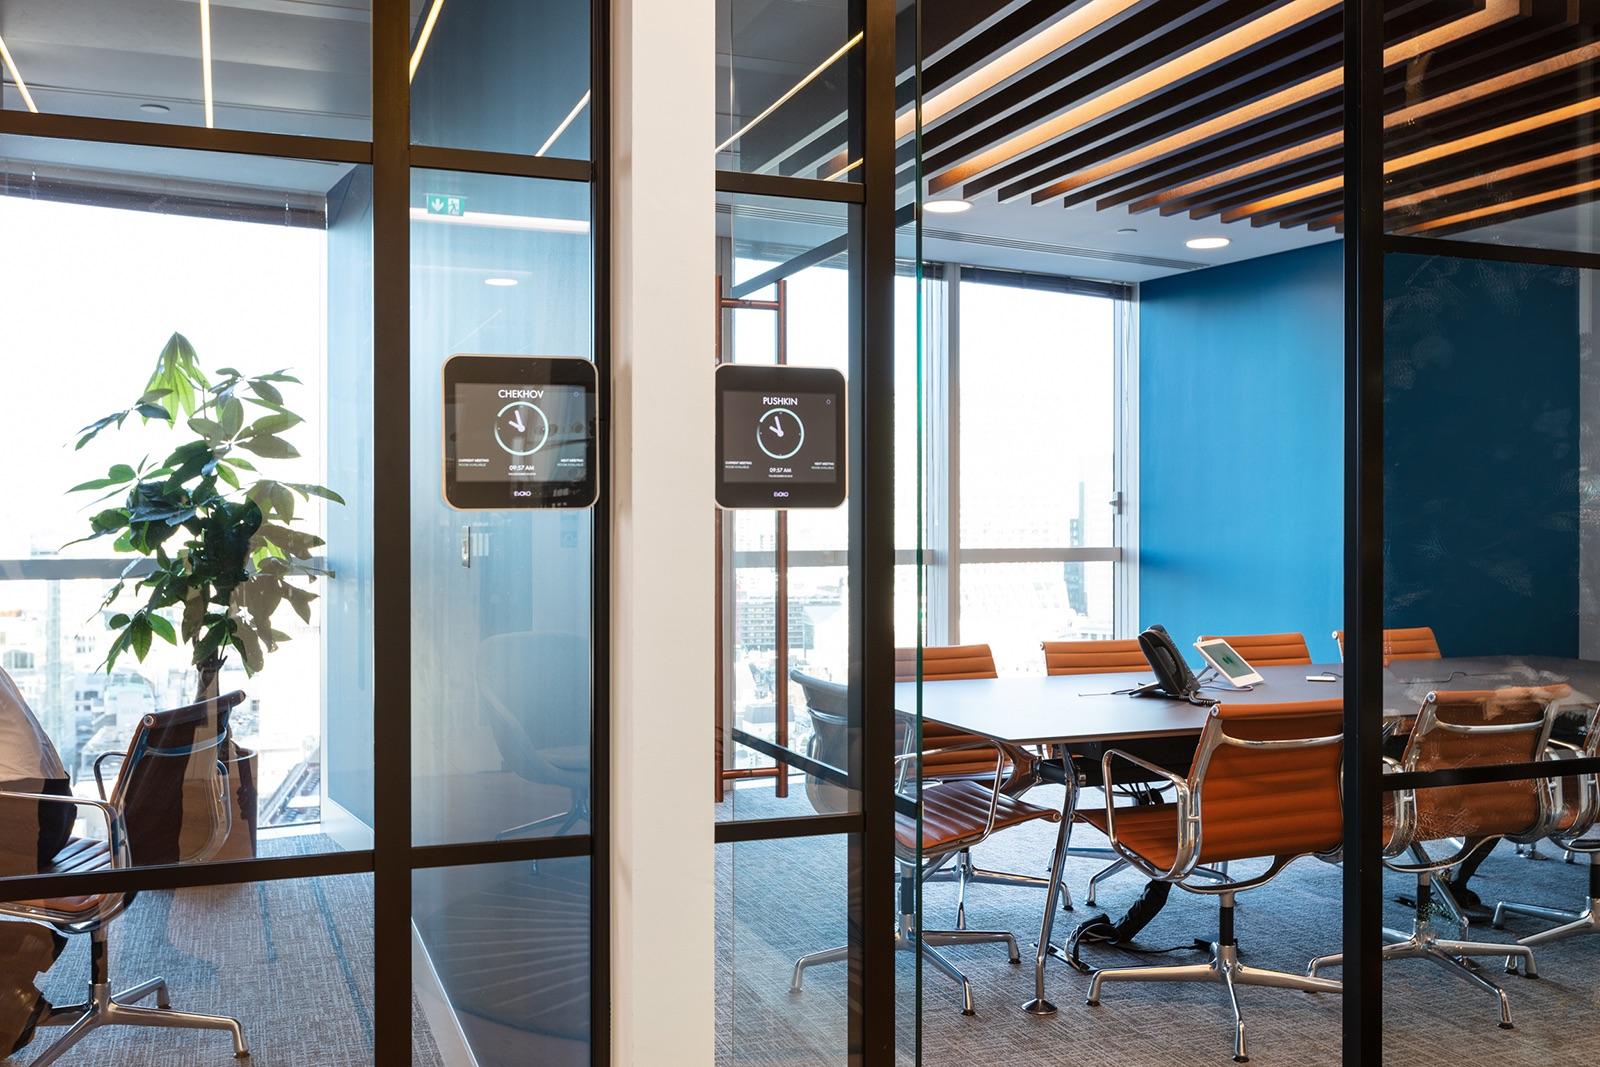 bcs-global-office-london-3